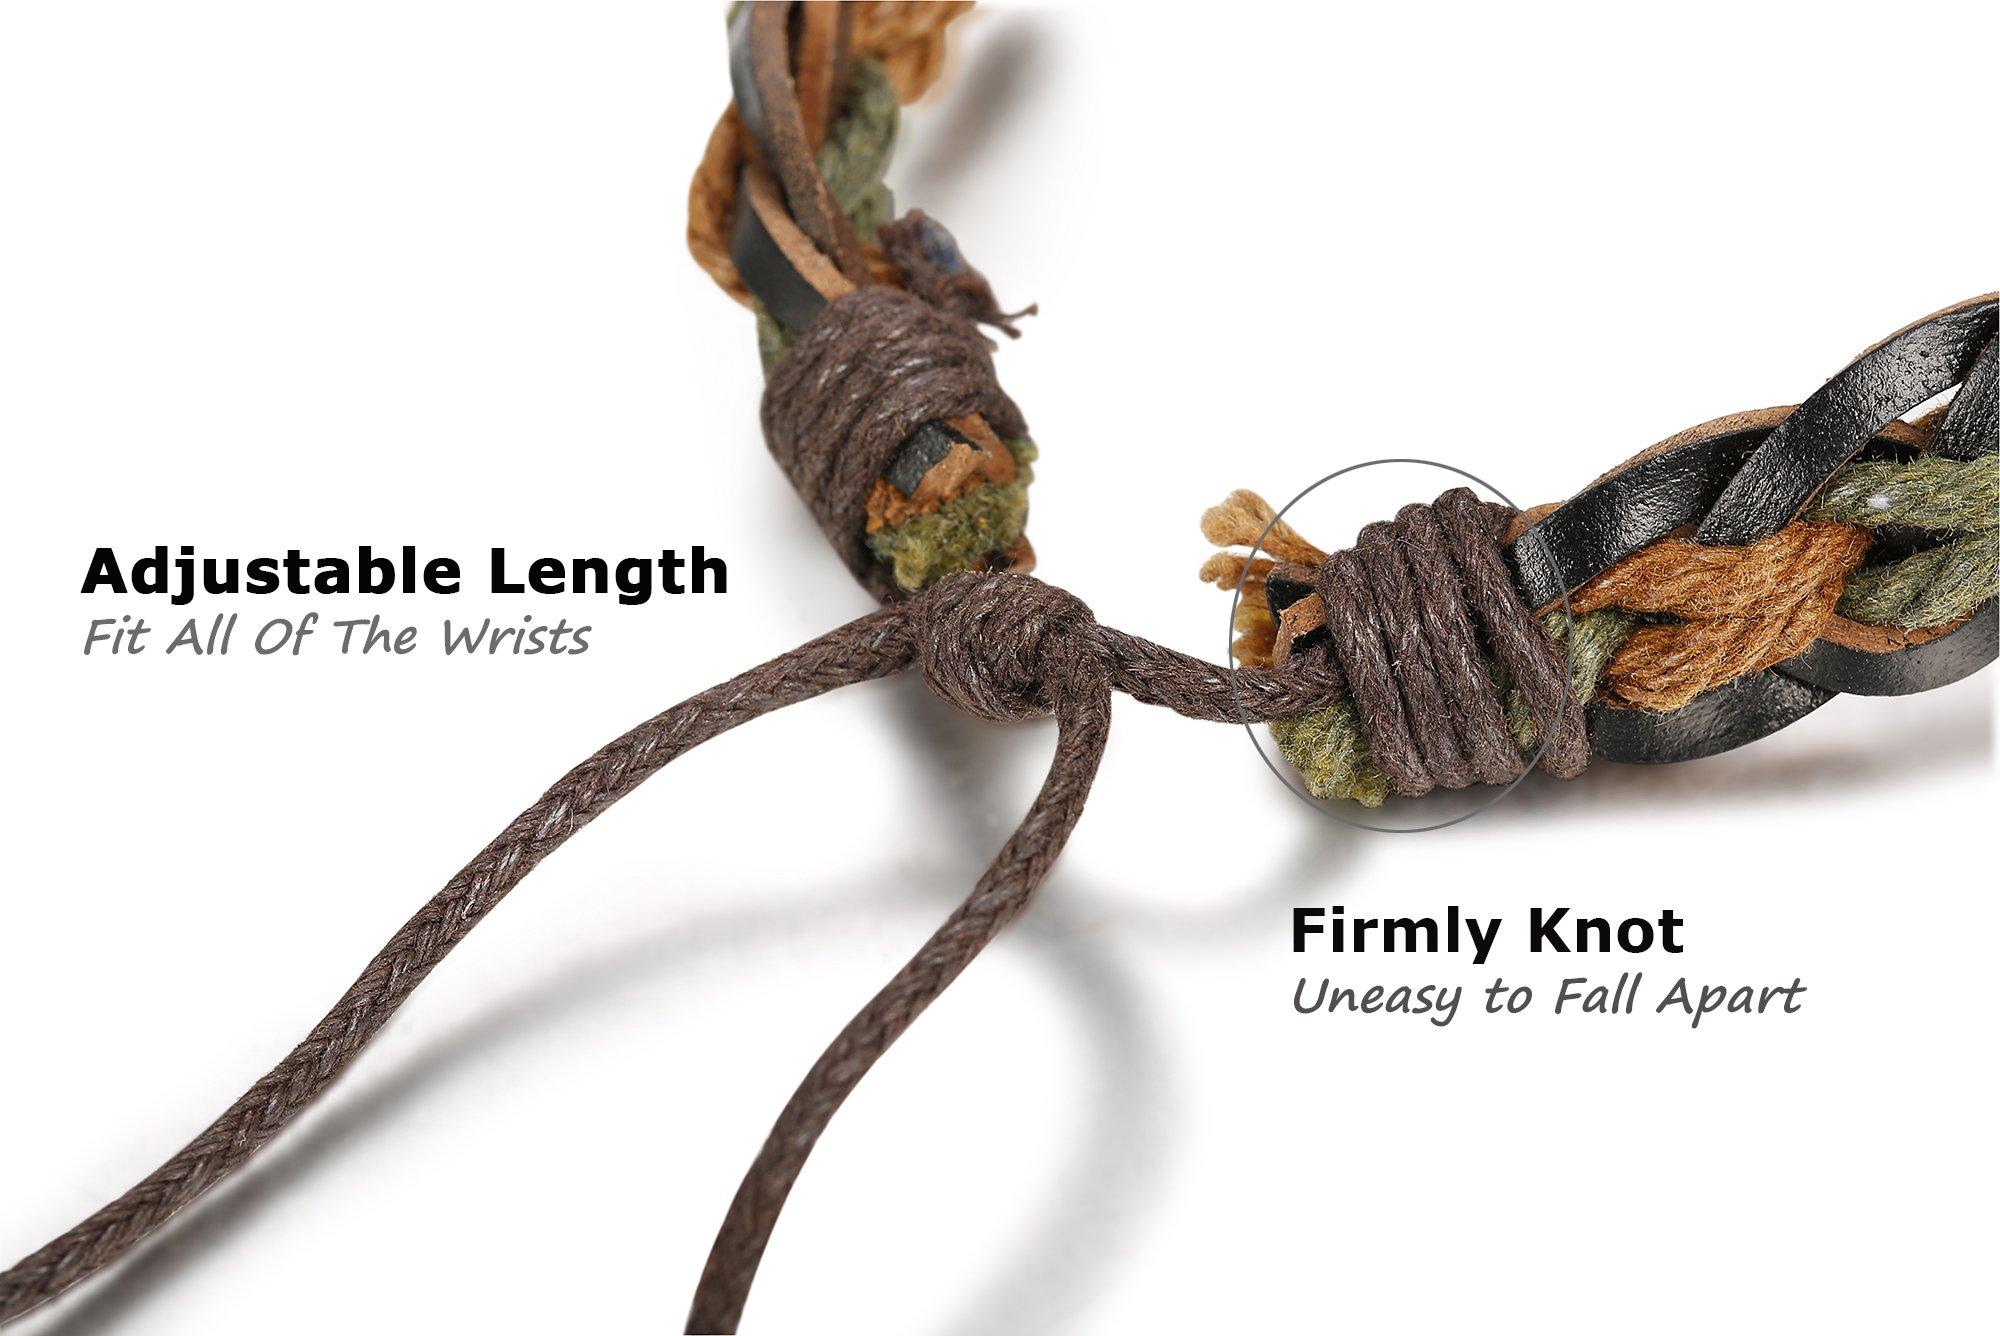 Jstyle 6-12Pcs Wrap Bracelets for Women Men Hemp Cords Ethnic Tribal Bracelet Wooden Beads Leather Bracelets Wristbands by Jstyle (Image #4)